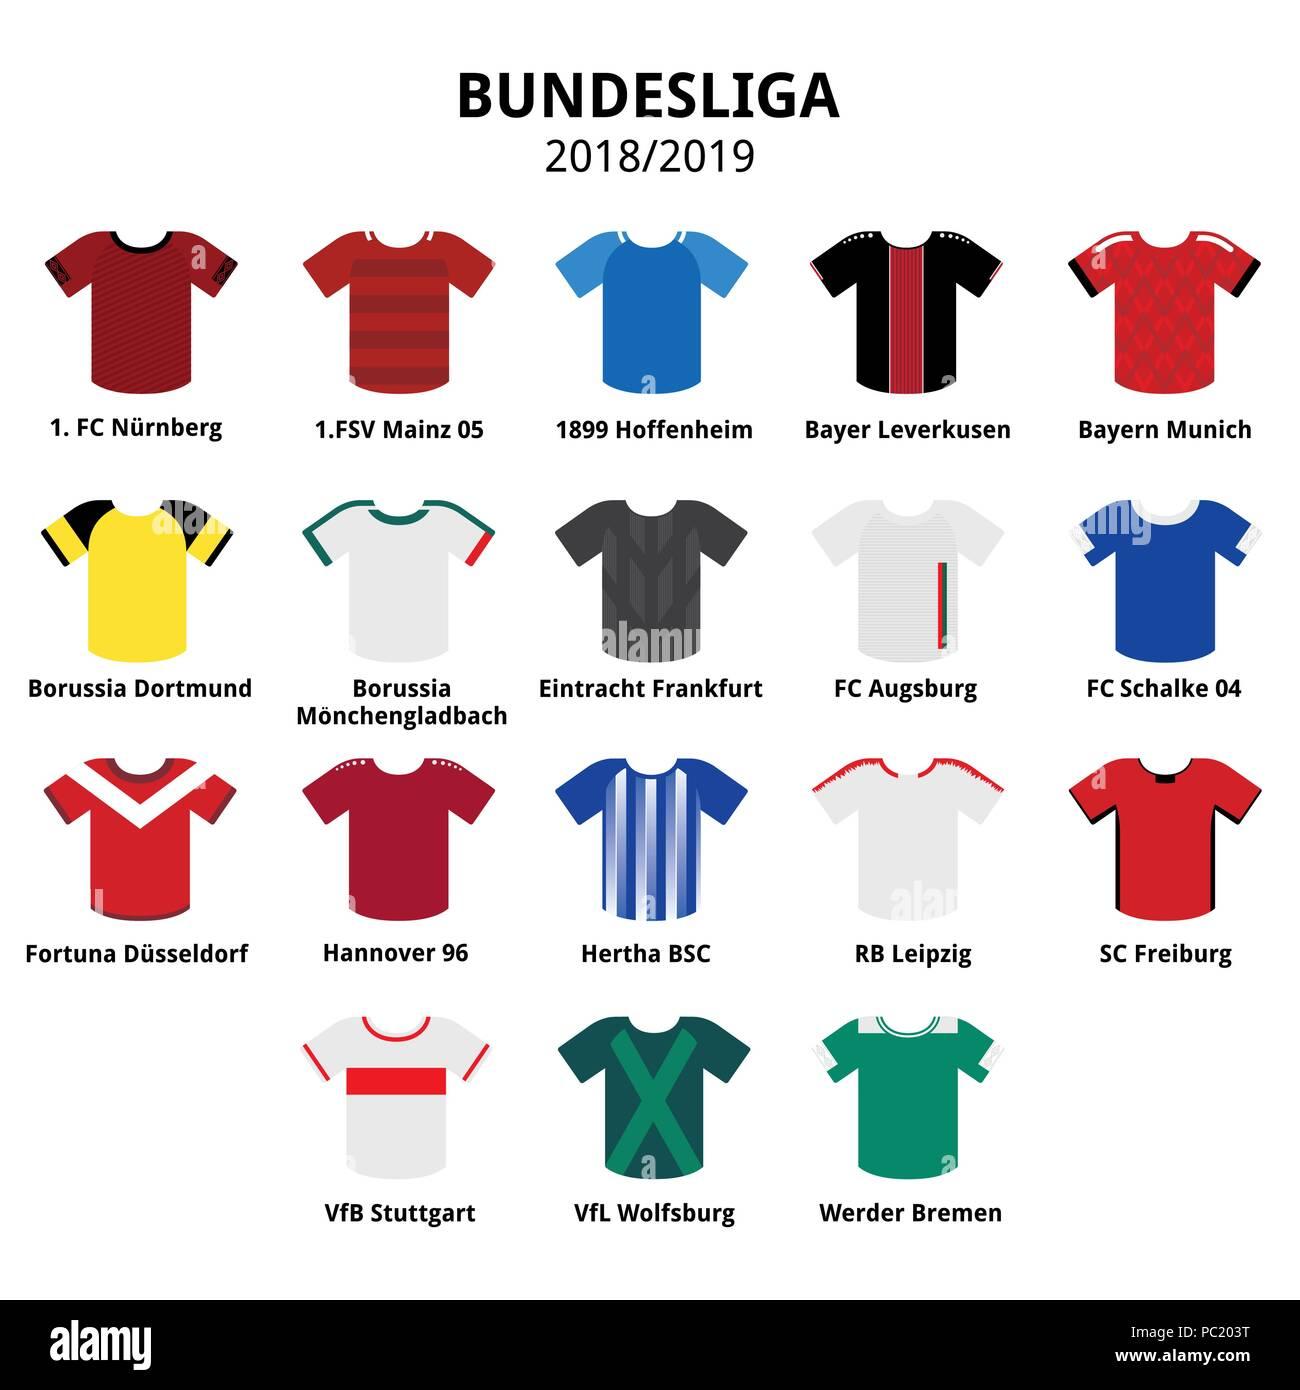 Bundesliga Jerseys Kit 2018 2019 German Football League Icons